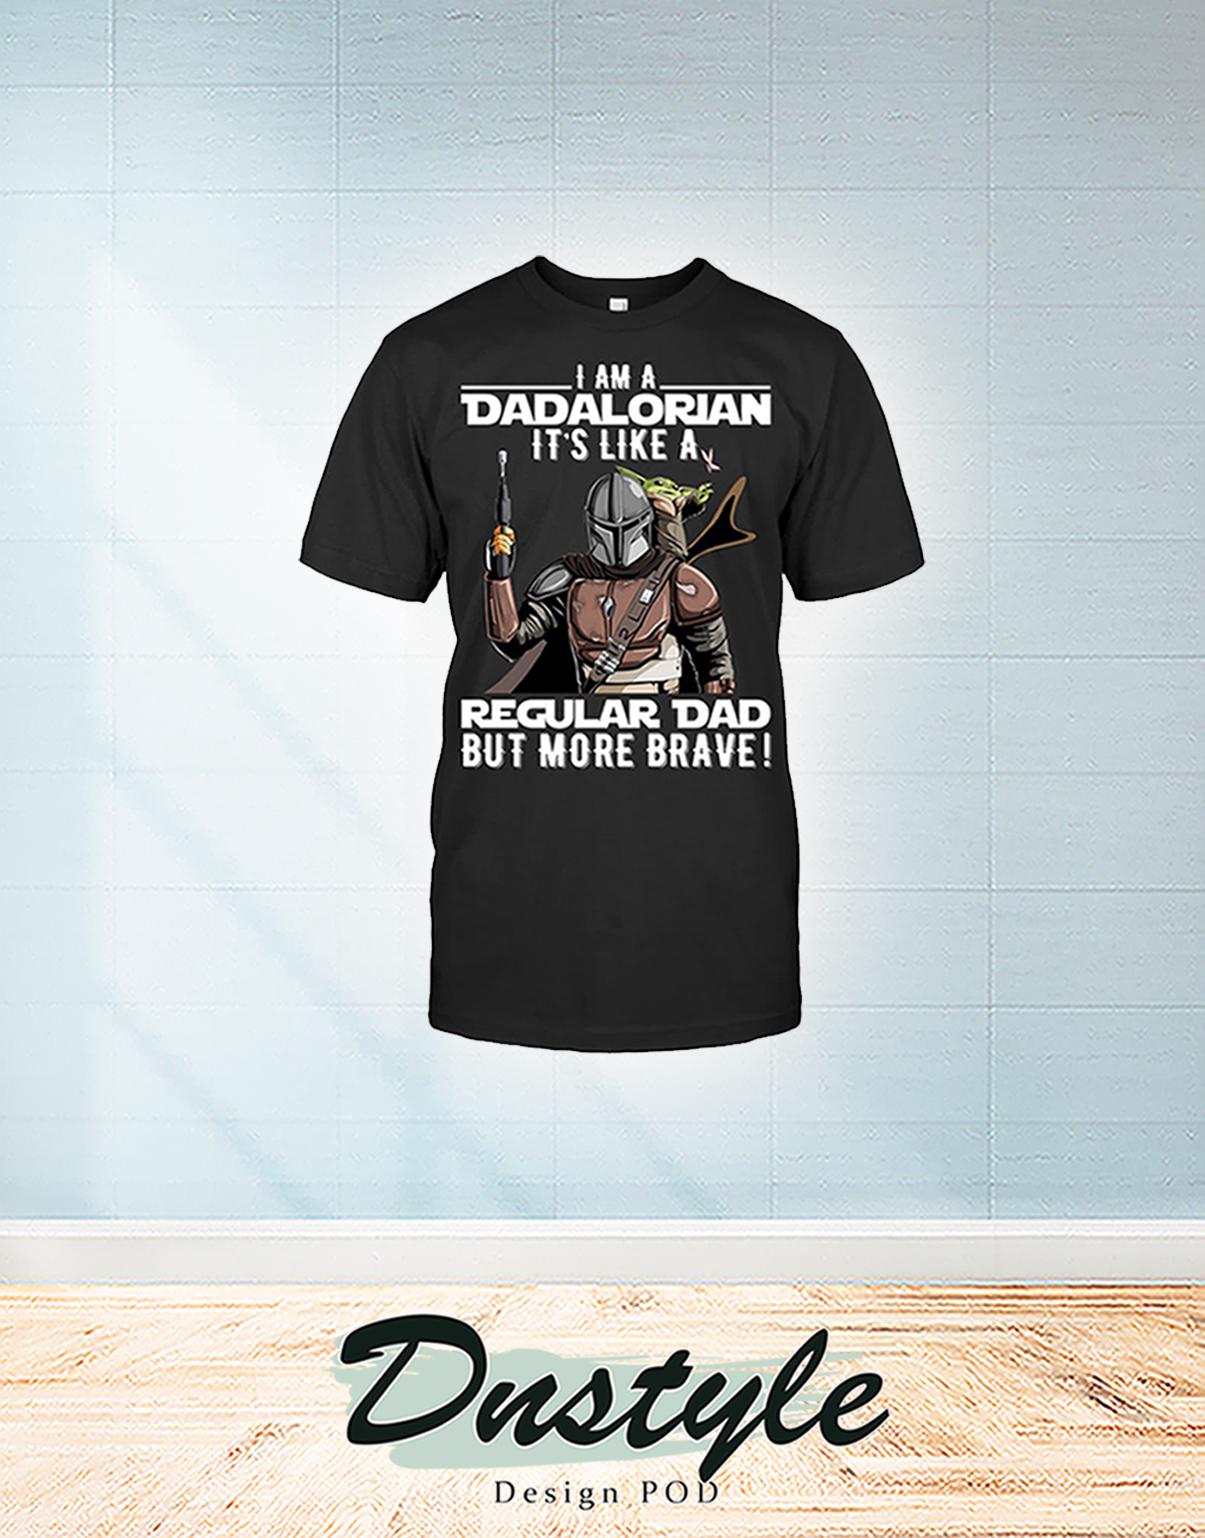 I am a dadalorian it's like a regular dad shirt